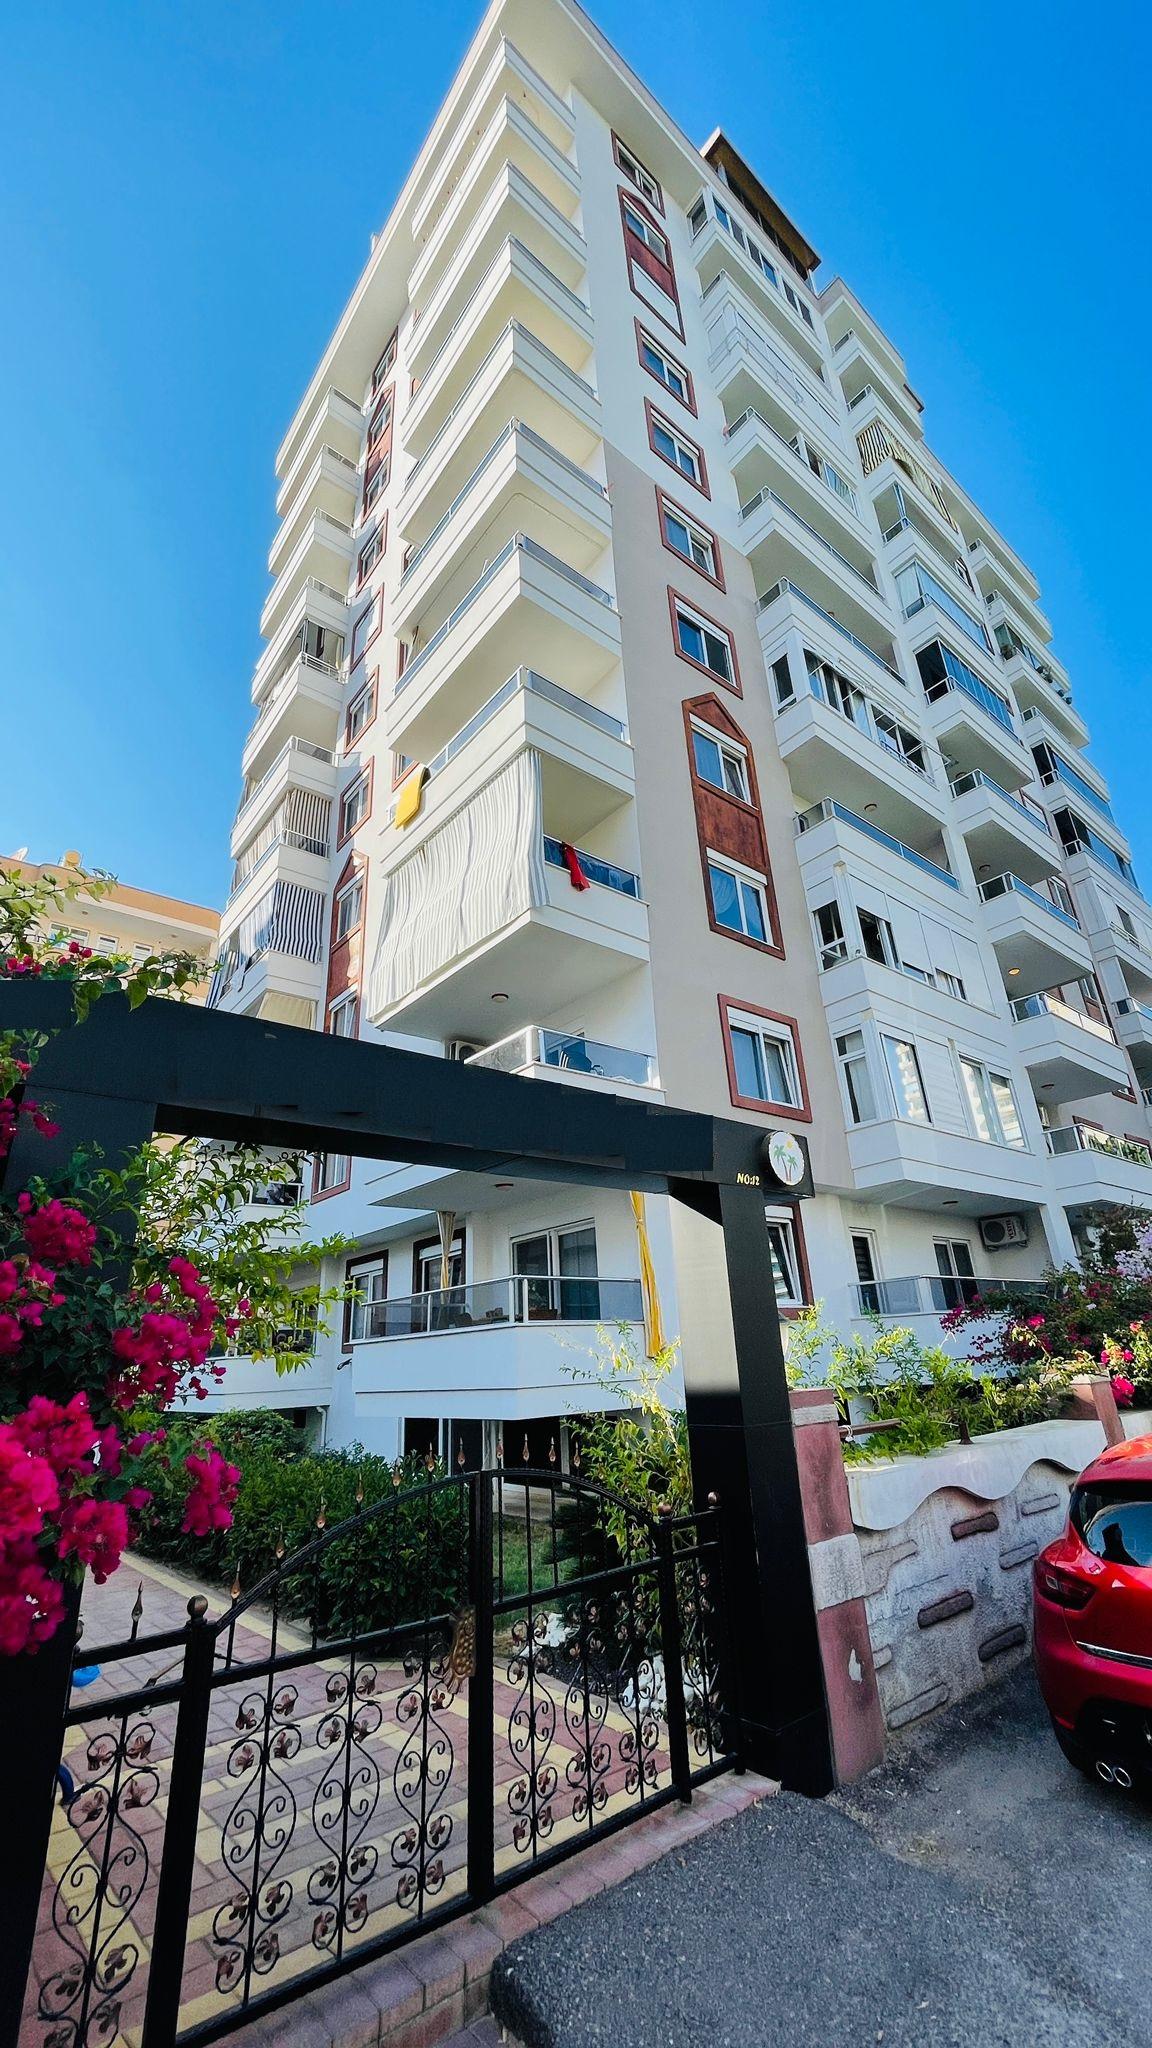 Меблированная квартира 2+1 в районе Махмутлар - Фото 1